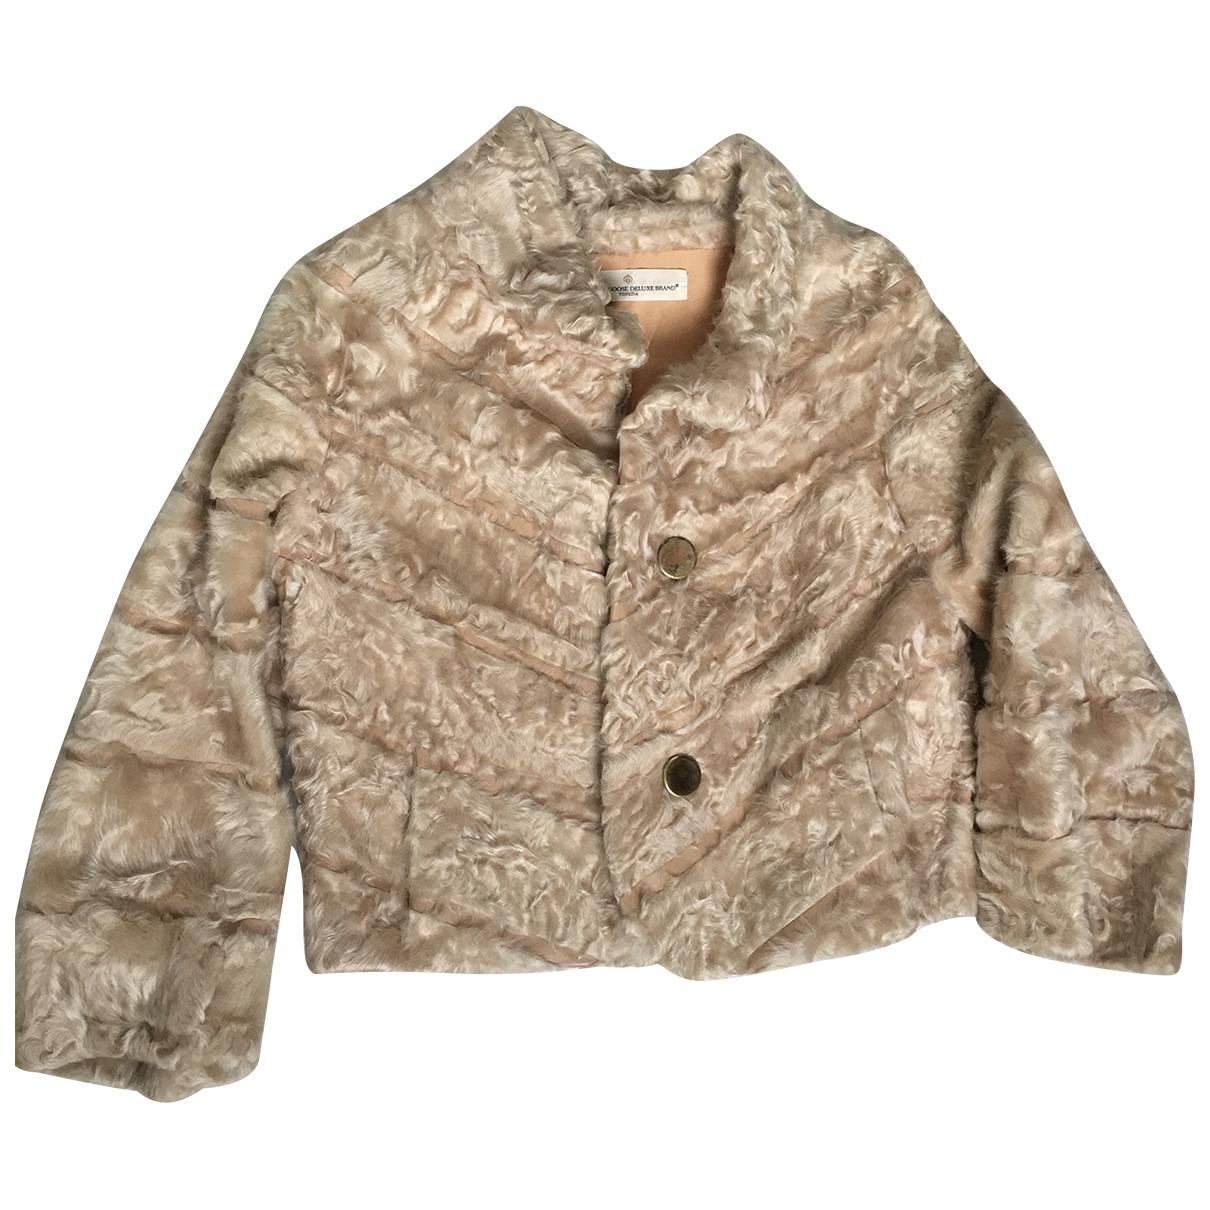 Golden Goose \N Ecru Fur coat for Women S International